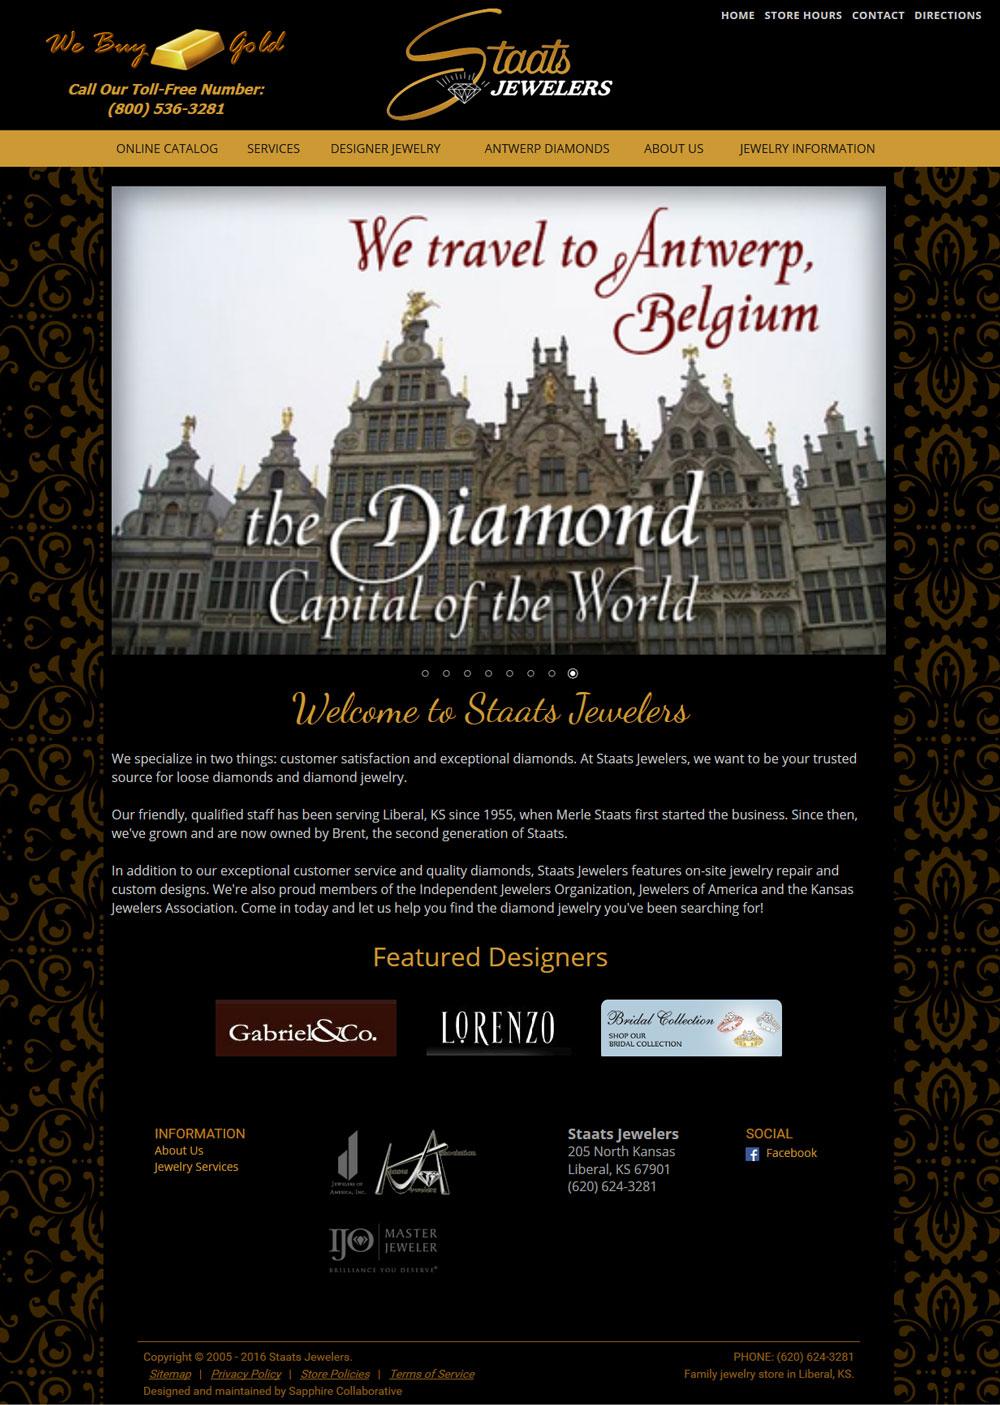 jewelry website design template example g